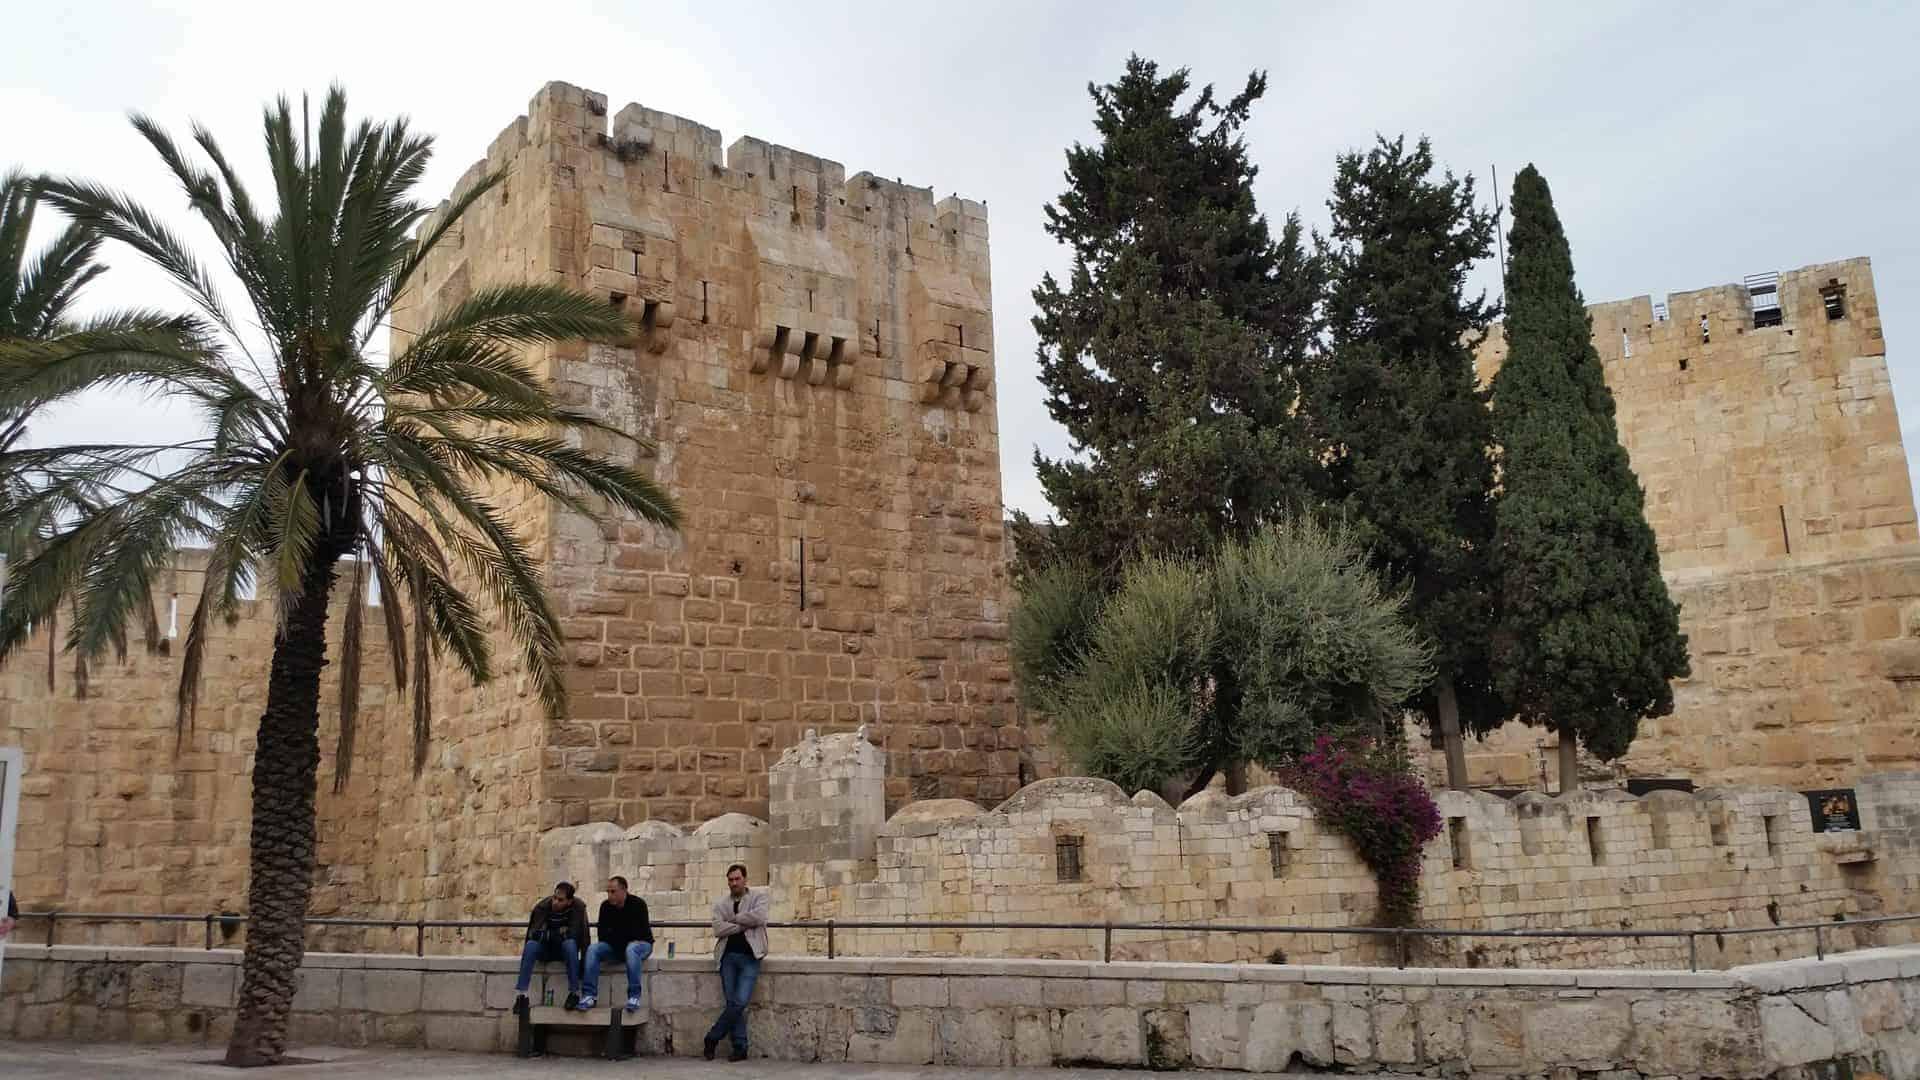 essentialjerusalem_tp2_The_Tower_of_David_Old_City_of_Jerusalem